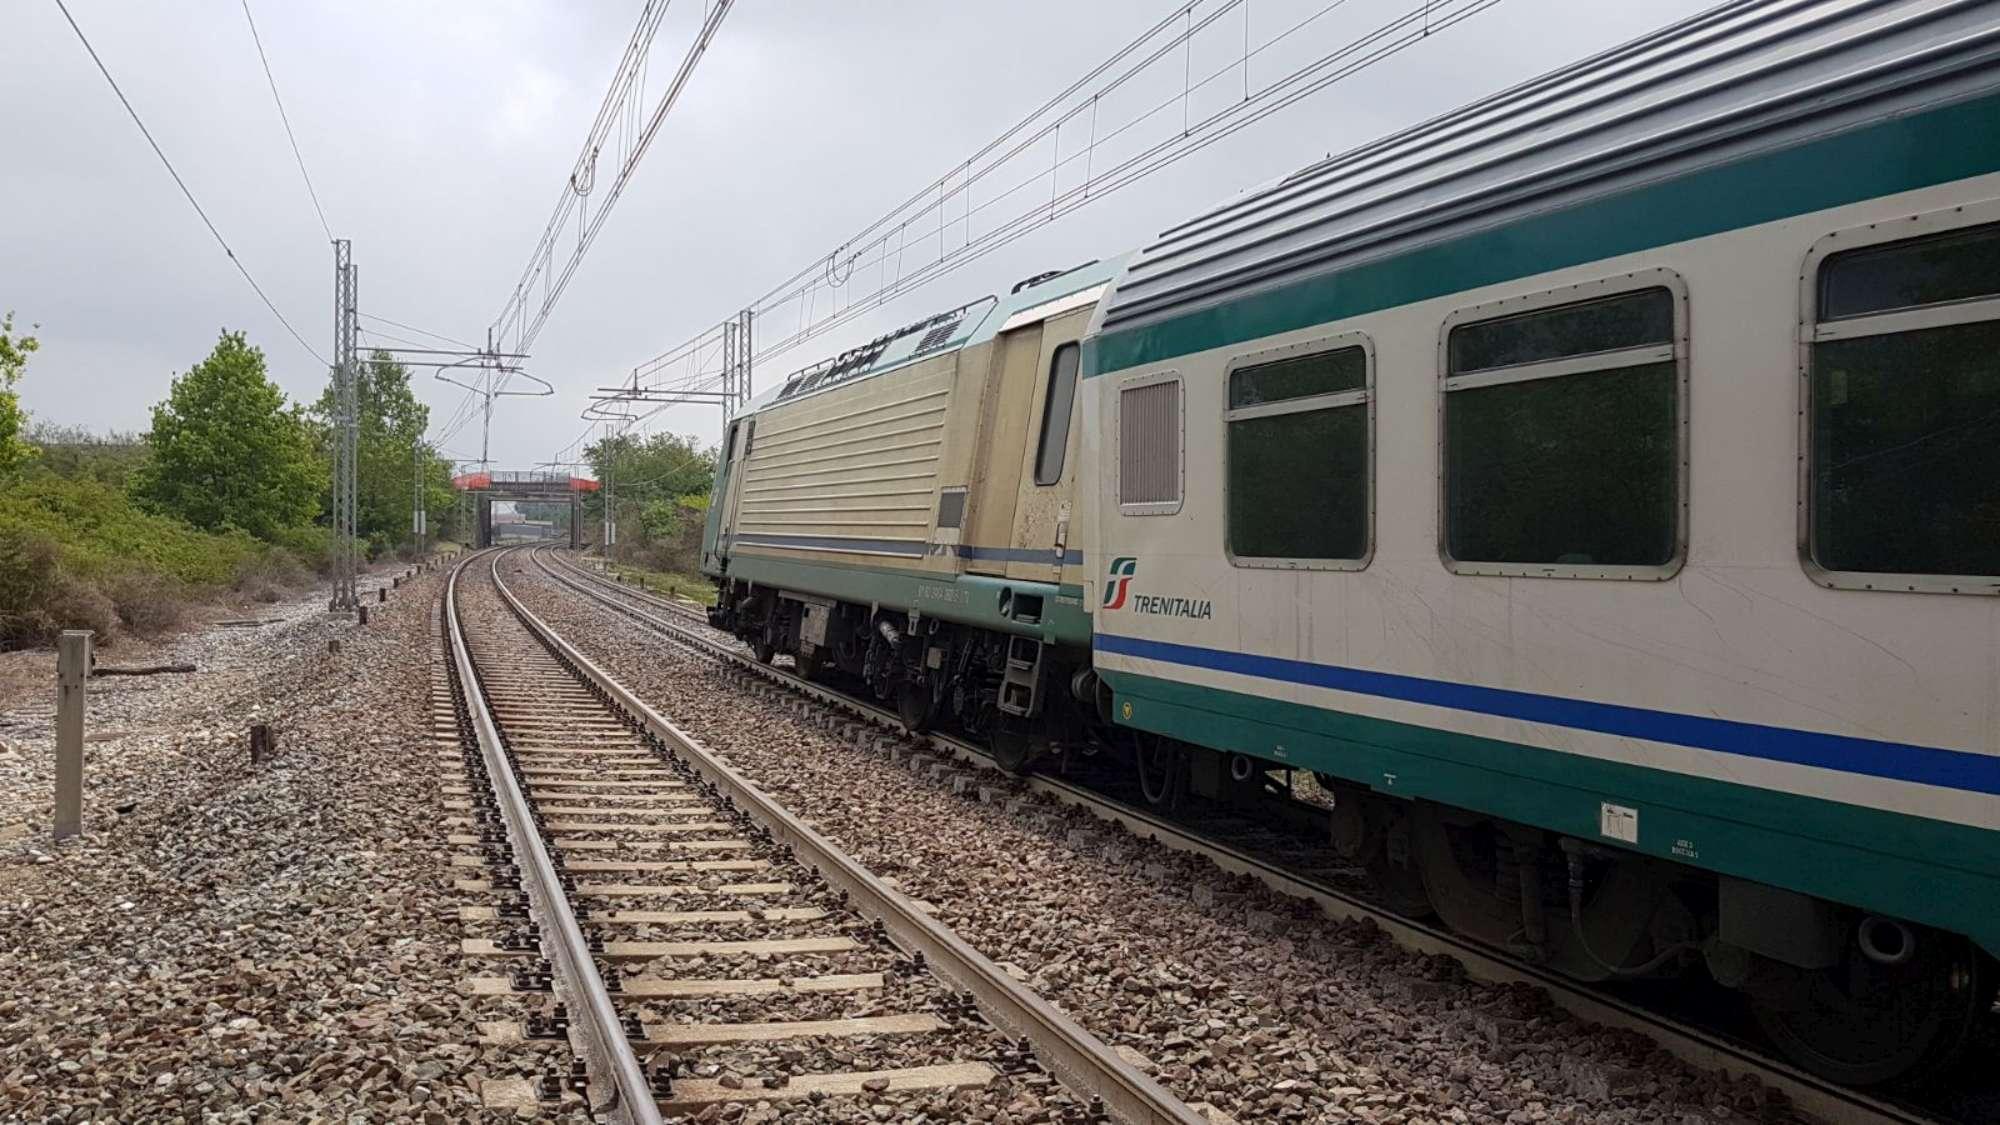 Gru privata urta treno regionale che esce dai binari nel Cuneese ... 3252017d4d